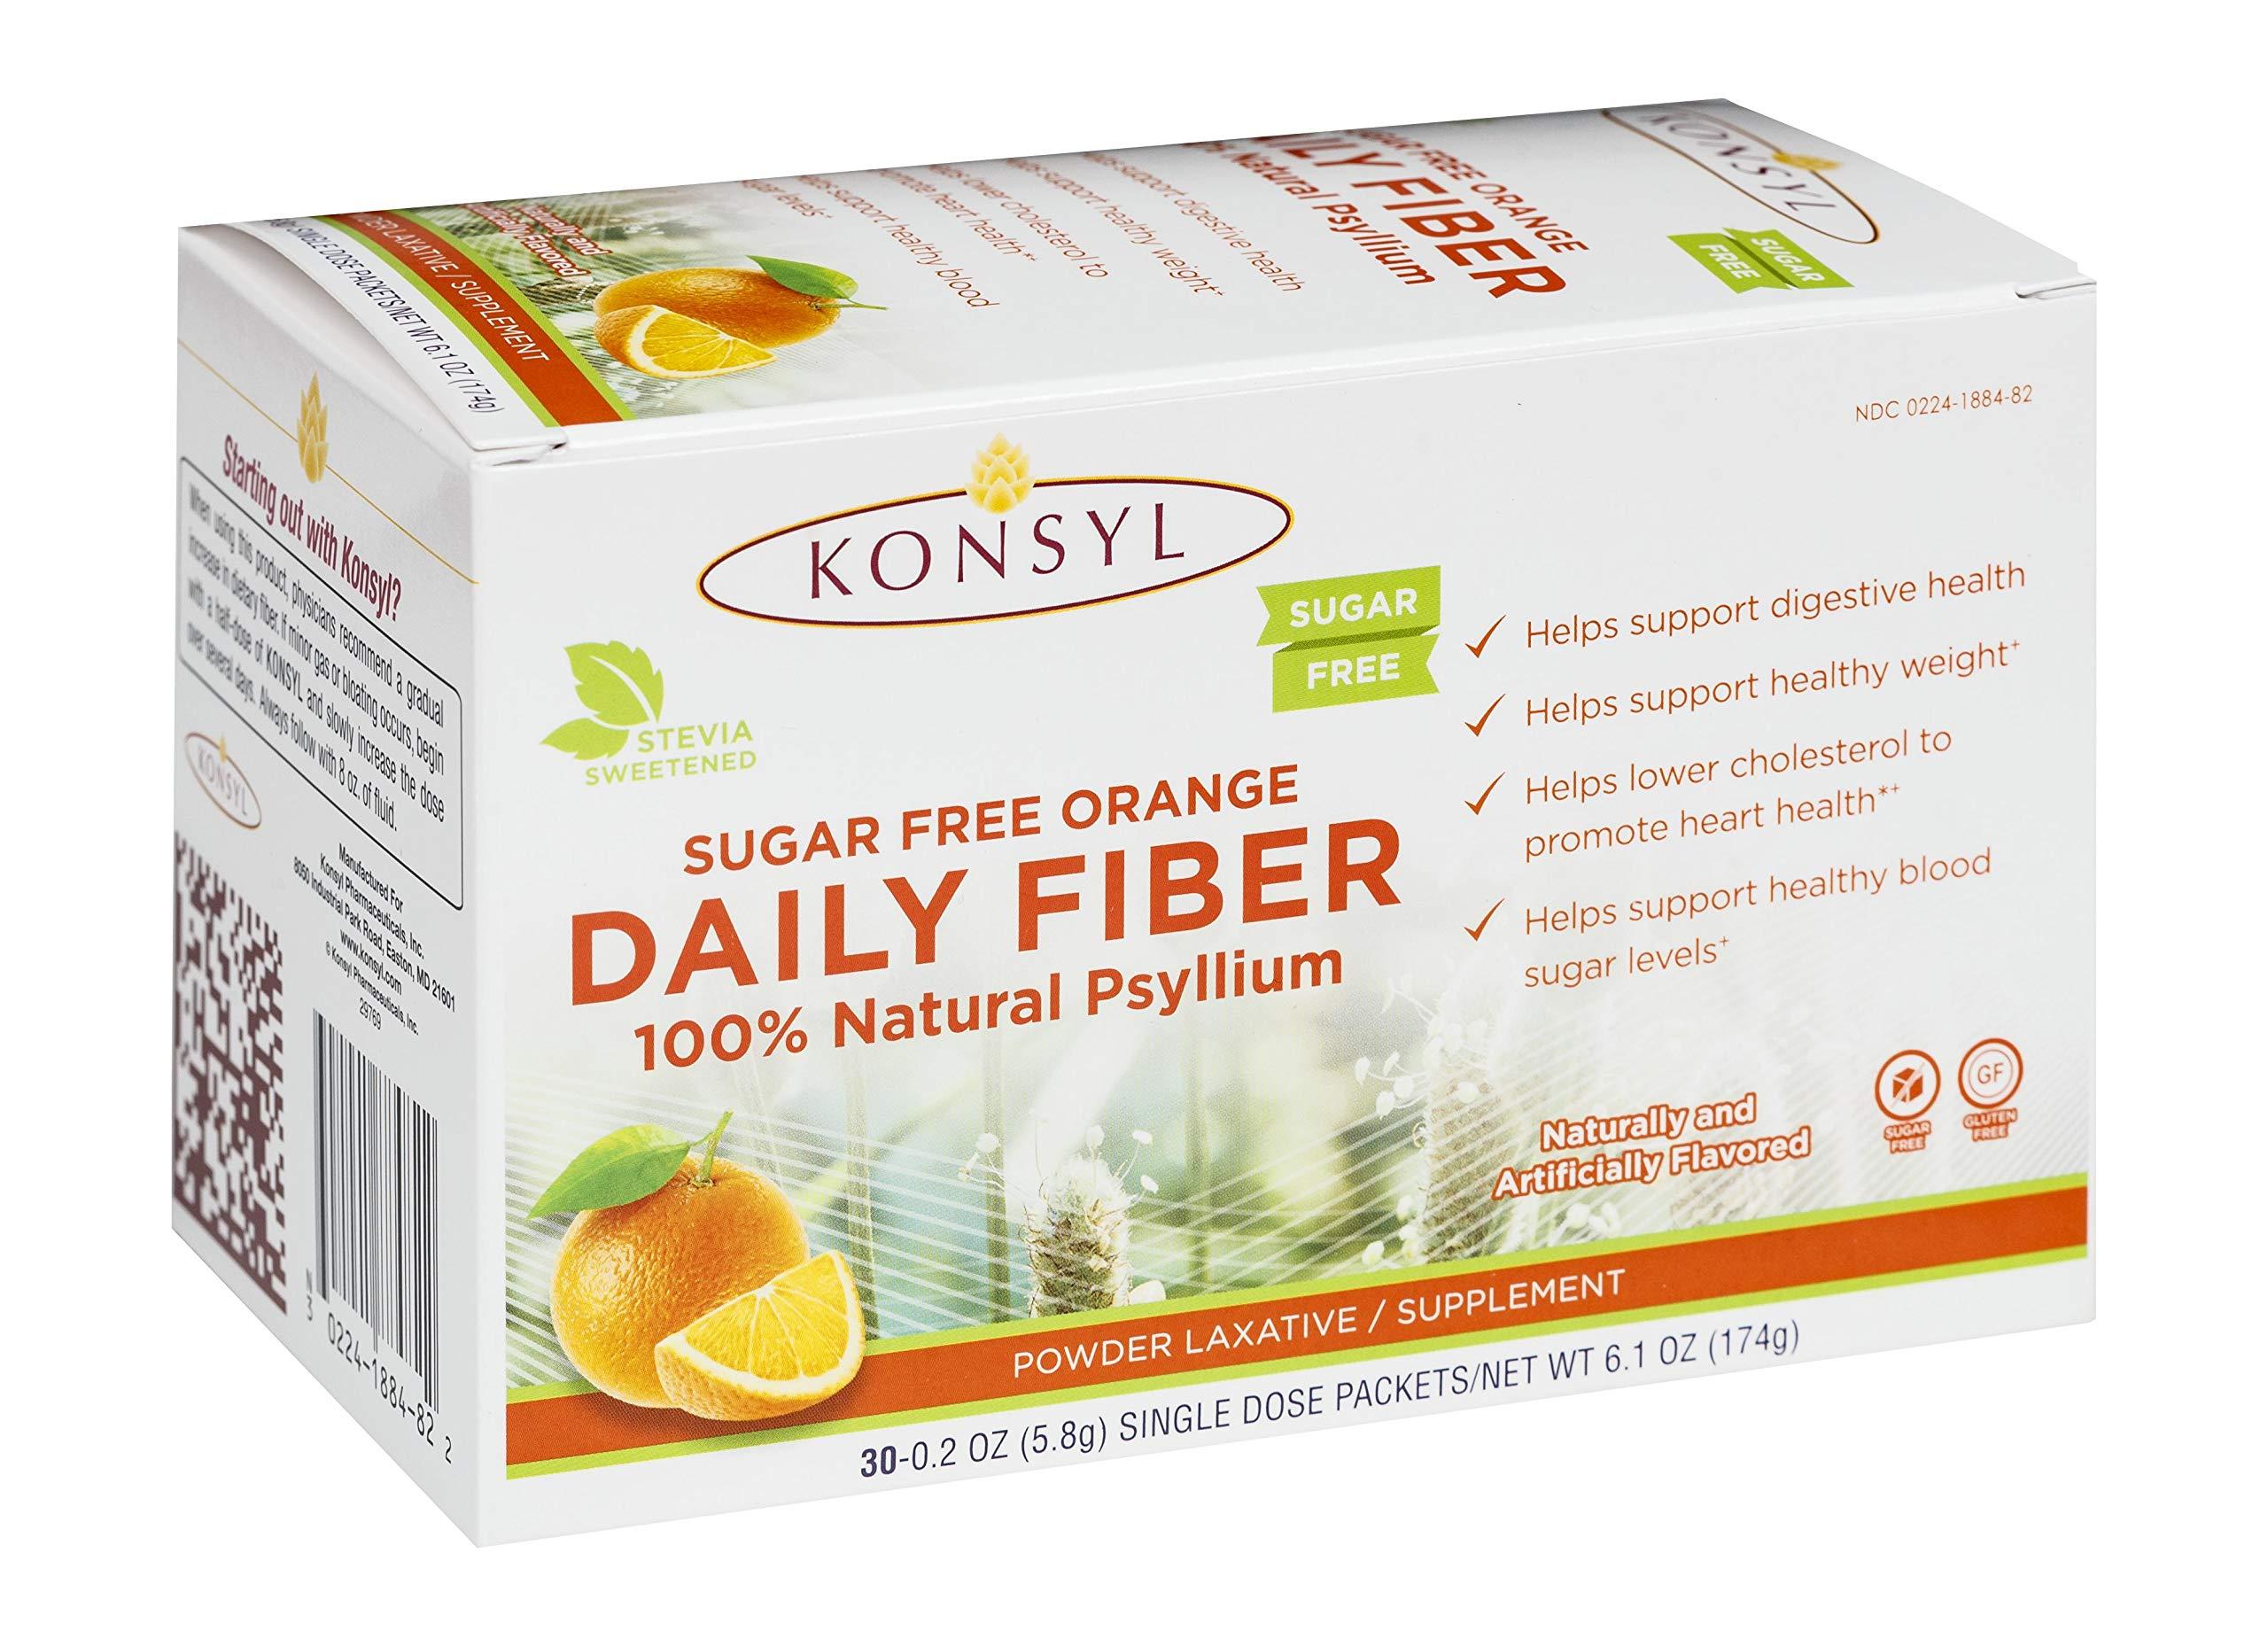 Konsyl Daily Fiber Orange 100% Natural Psyllium Husk Powder - Sugar Free and Gluten Free - 30 Individual Packets